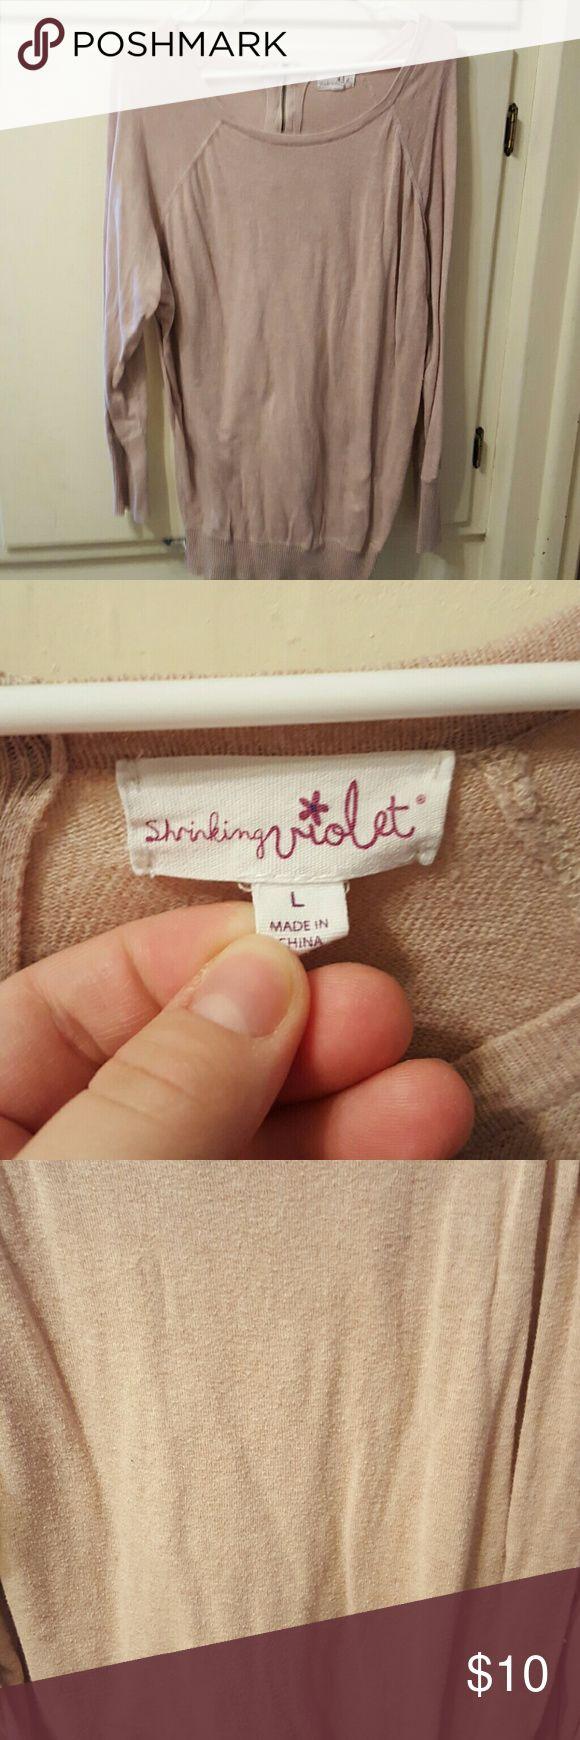 pink nudes shirt very cute some peeling shown shrinking violet  Tops Sweatshirts & Hoodies